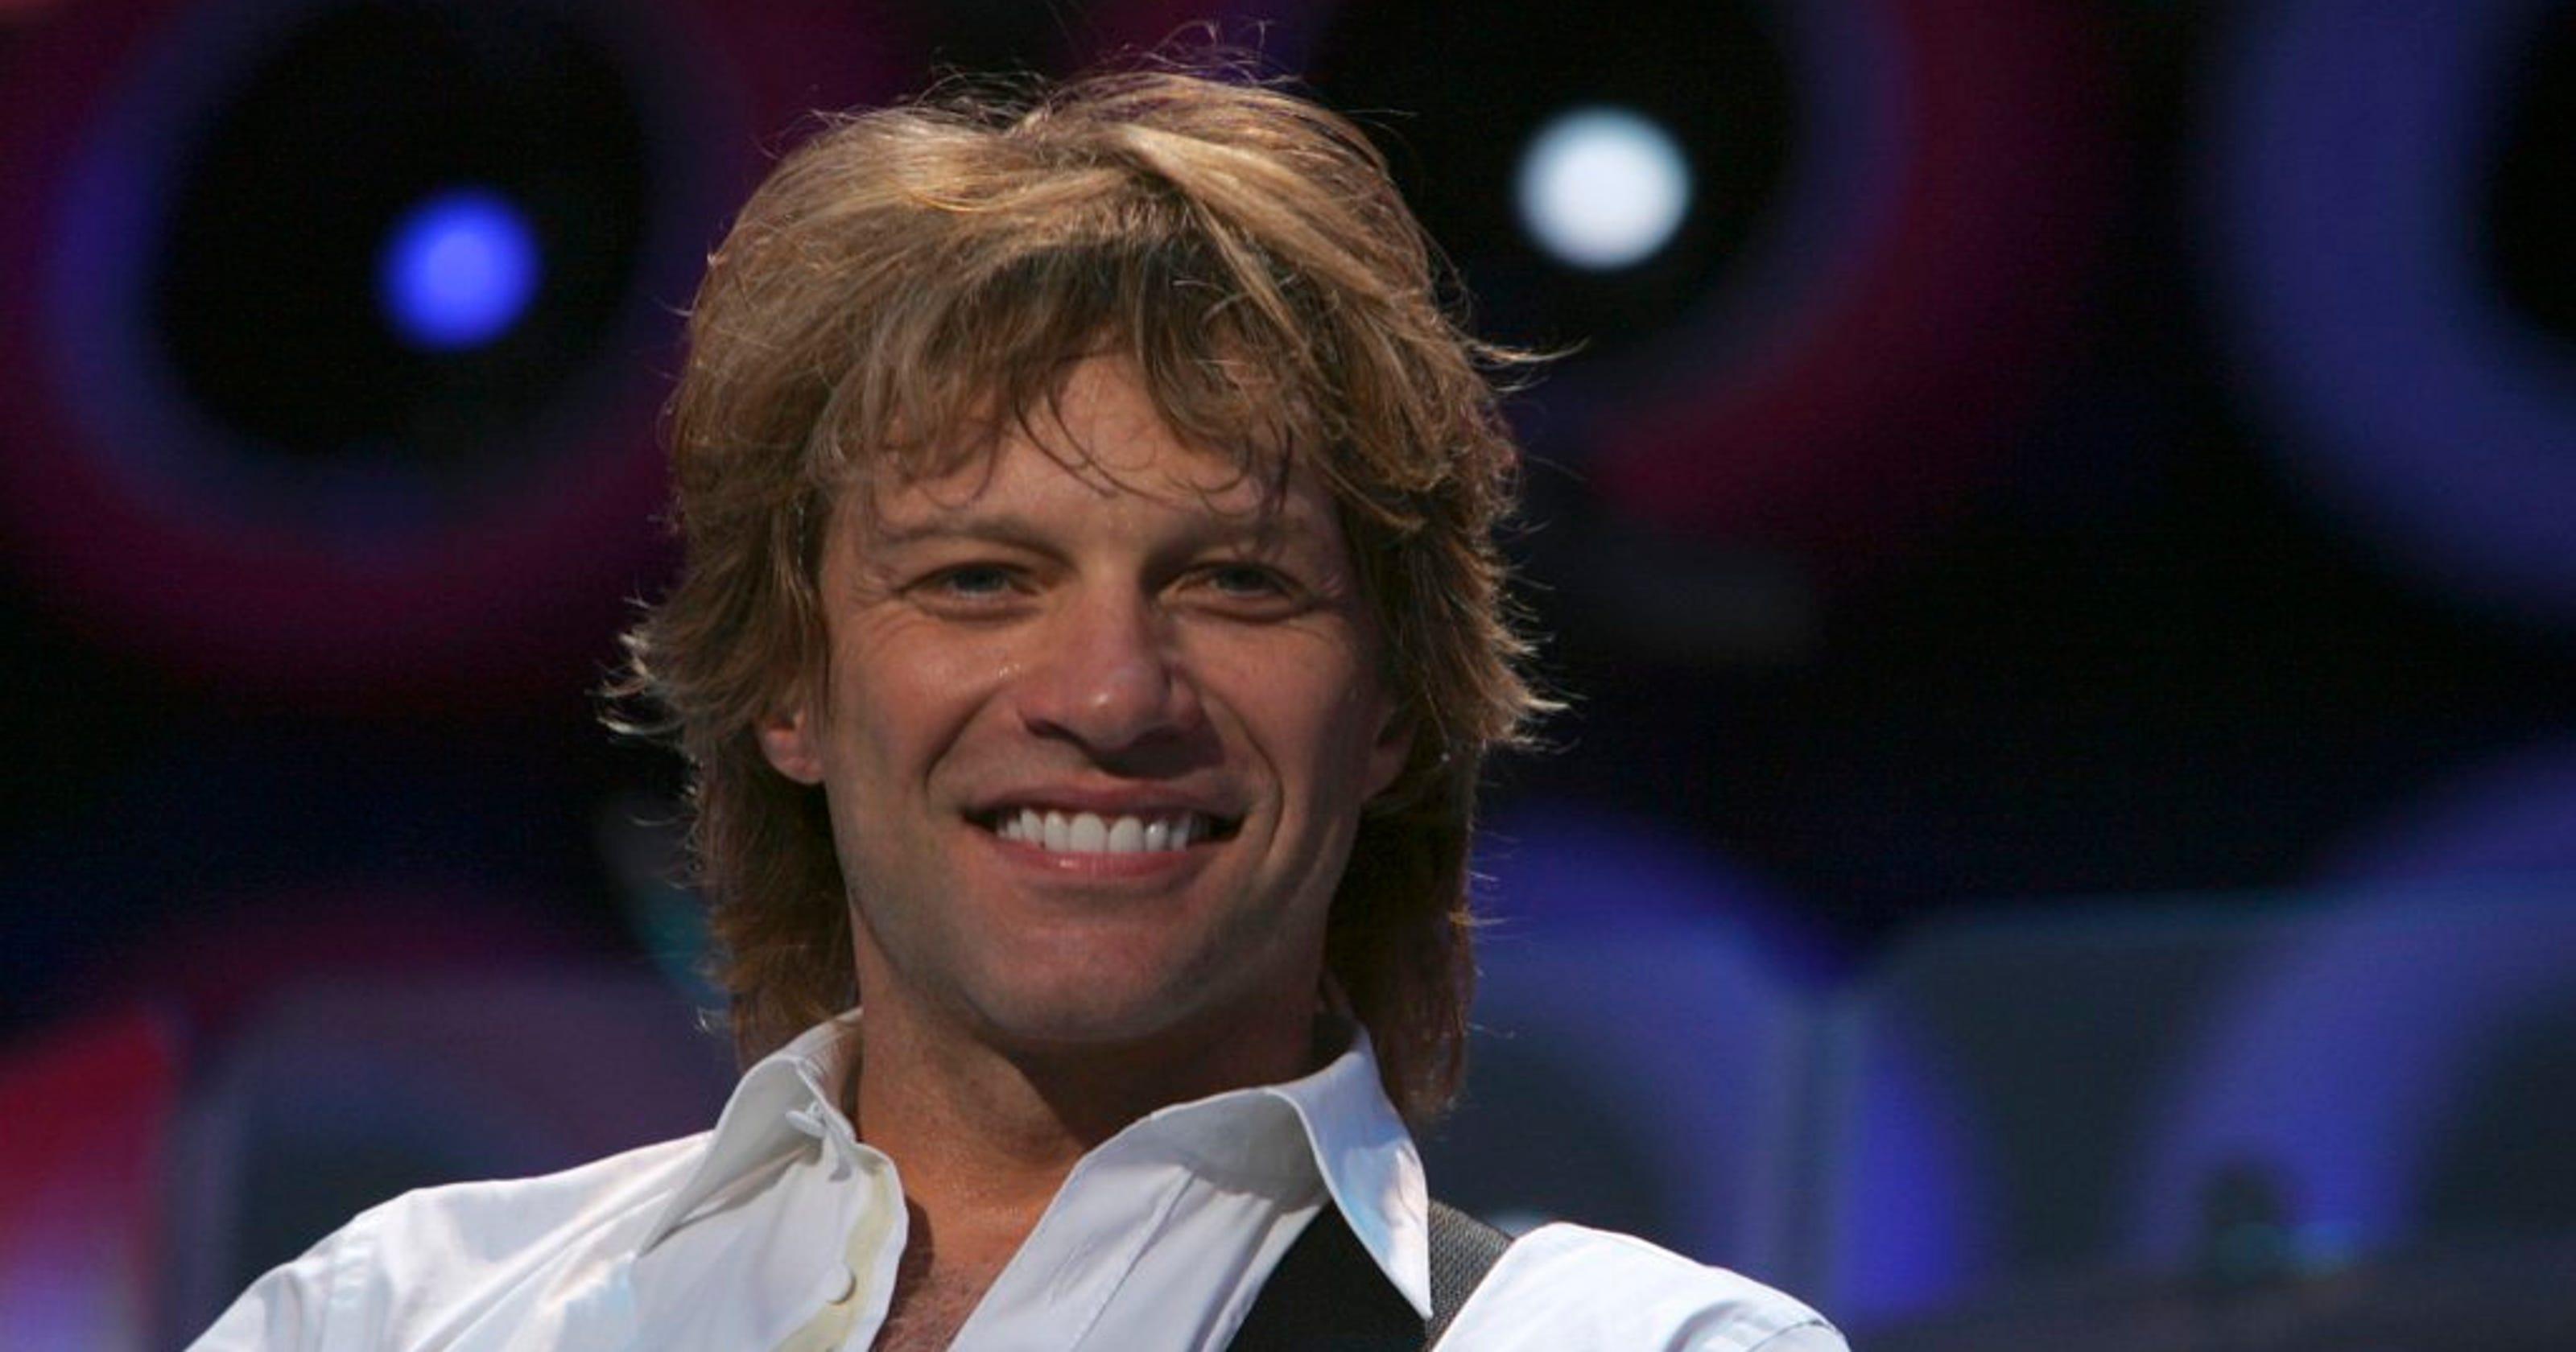 When Bon Jovi, Cindy Crawford snuggled up next to a Christmas tree